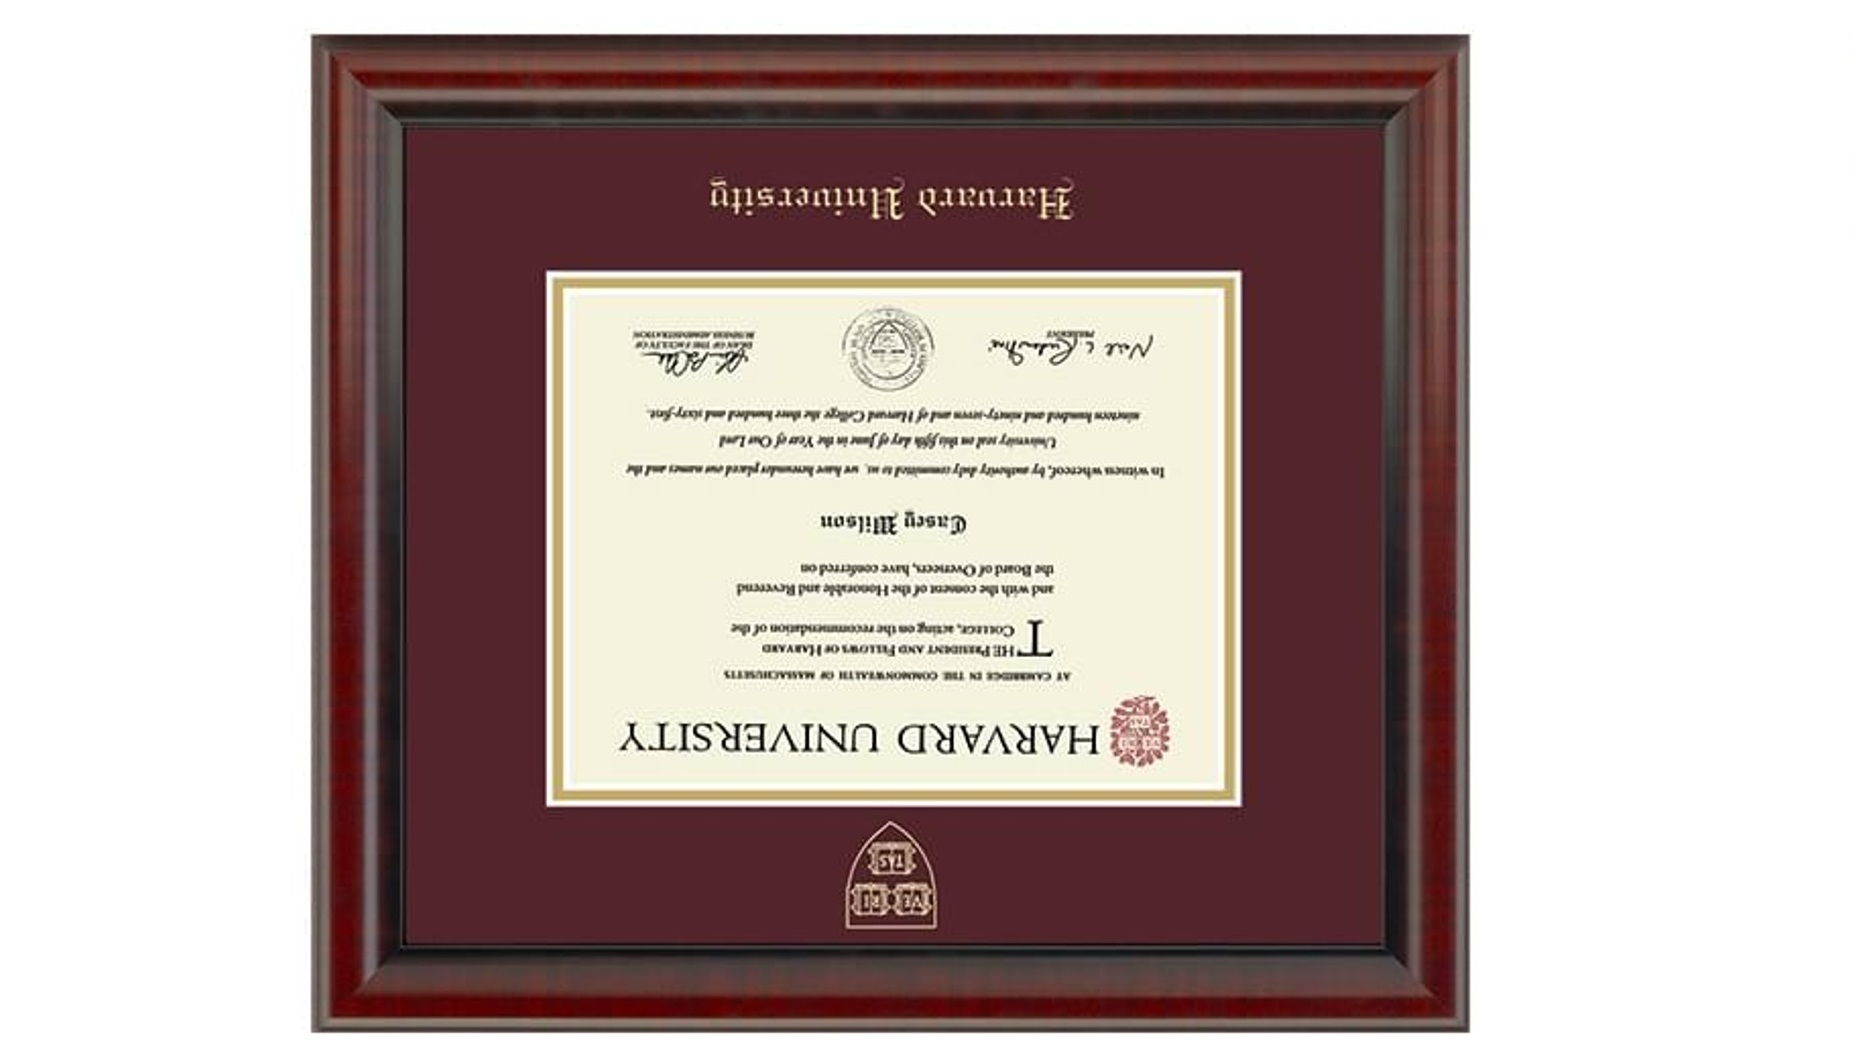 Harvard diploma